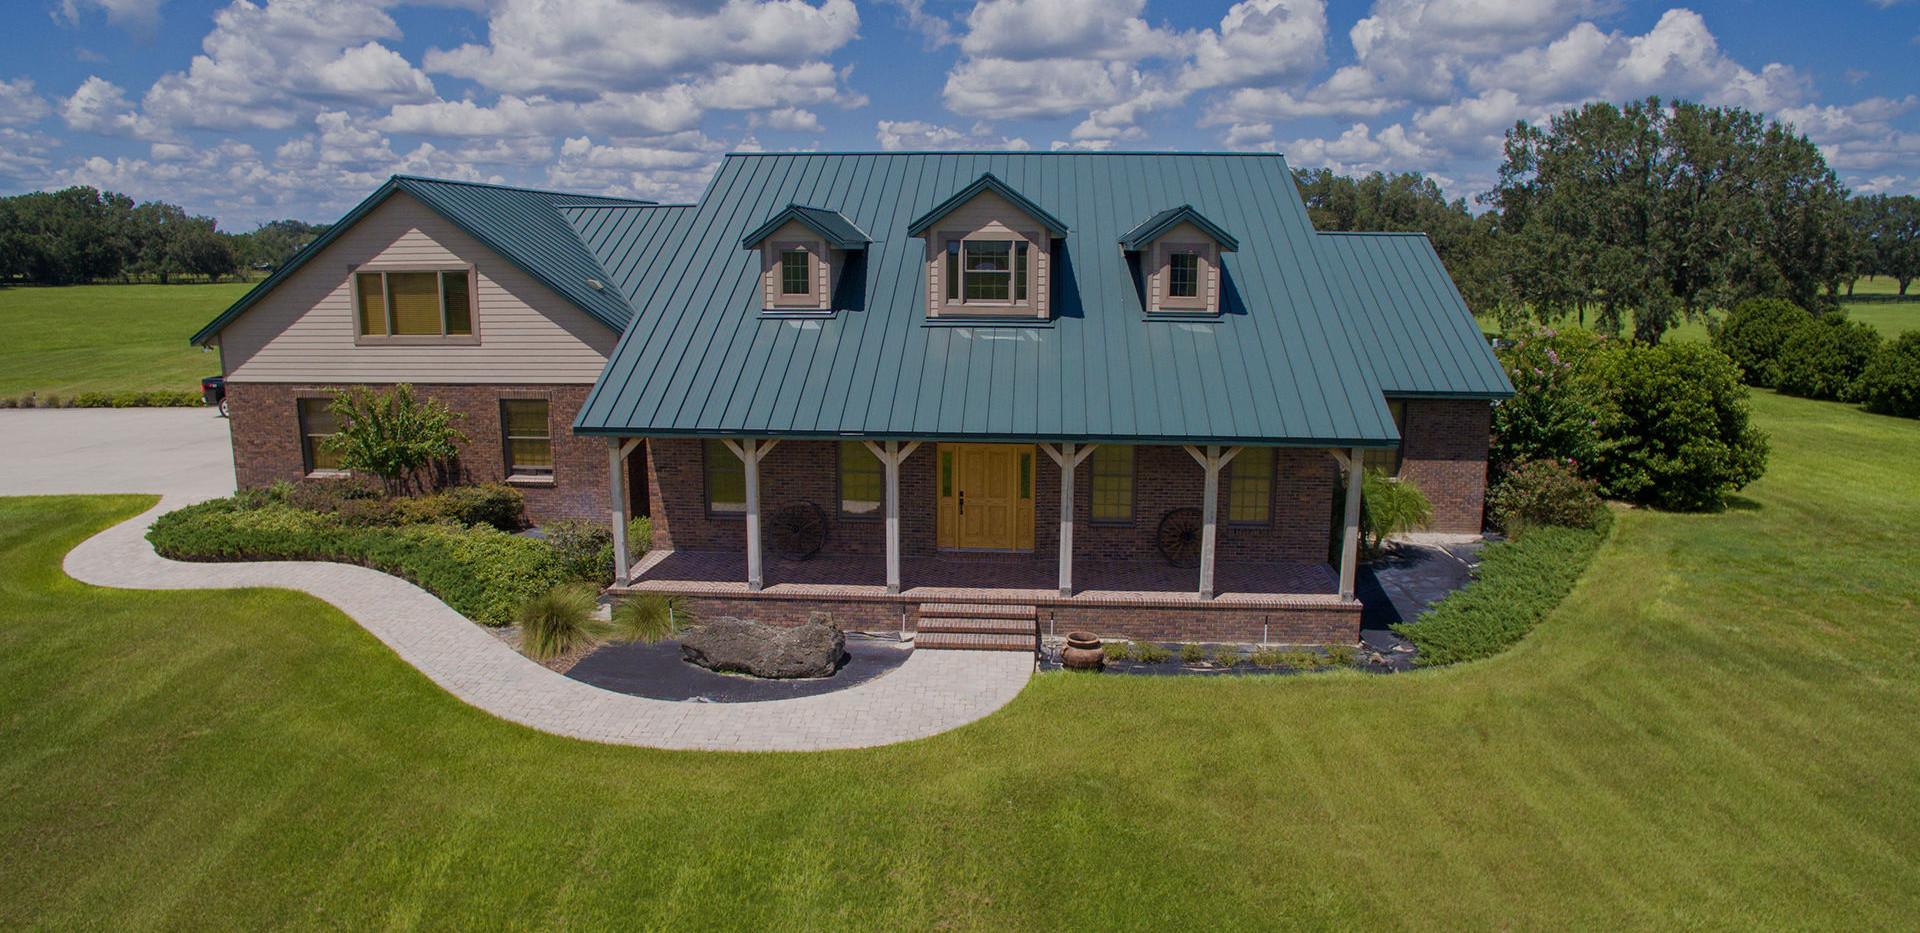 Large Farm - Custom Home